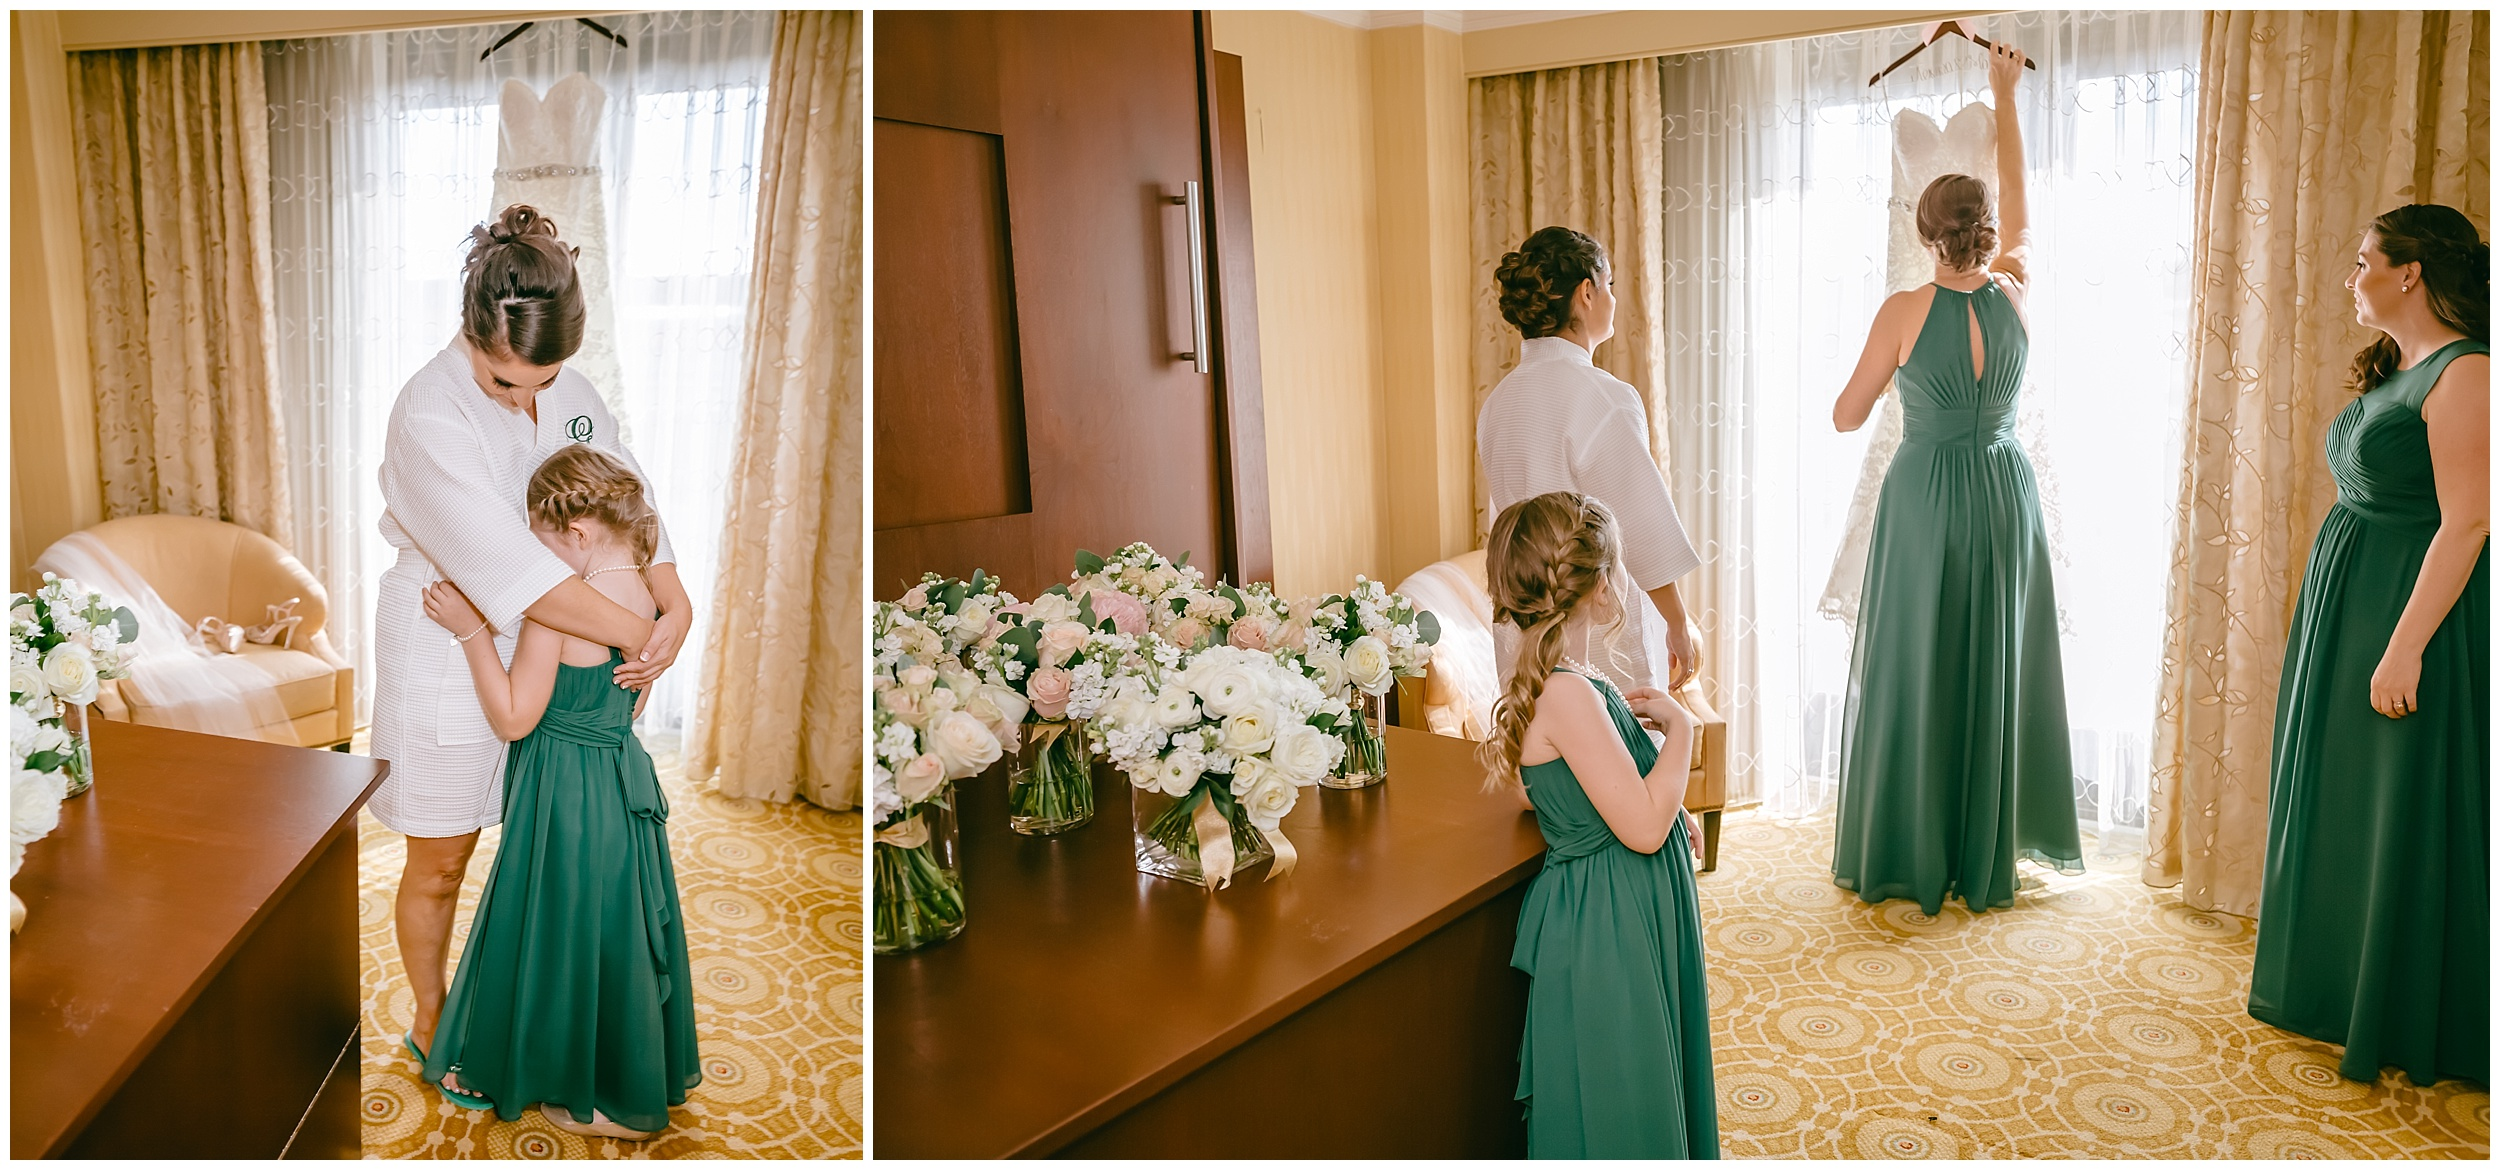 wedding-dress-getting-dressed-window-washington-dc-photographer